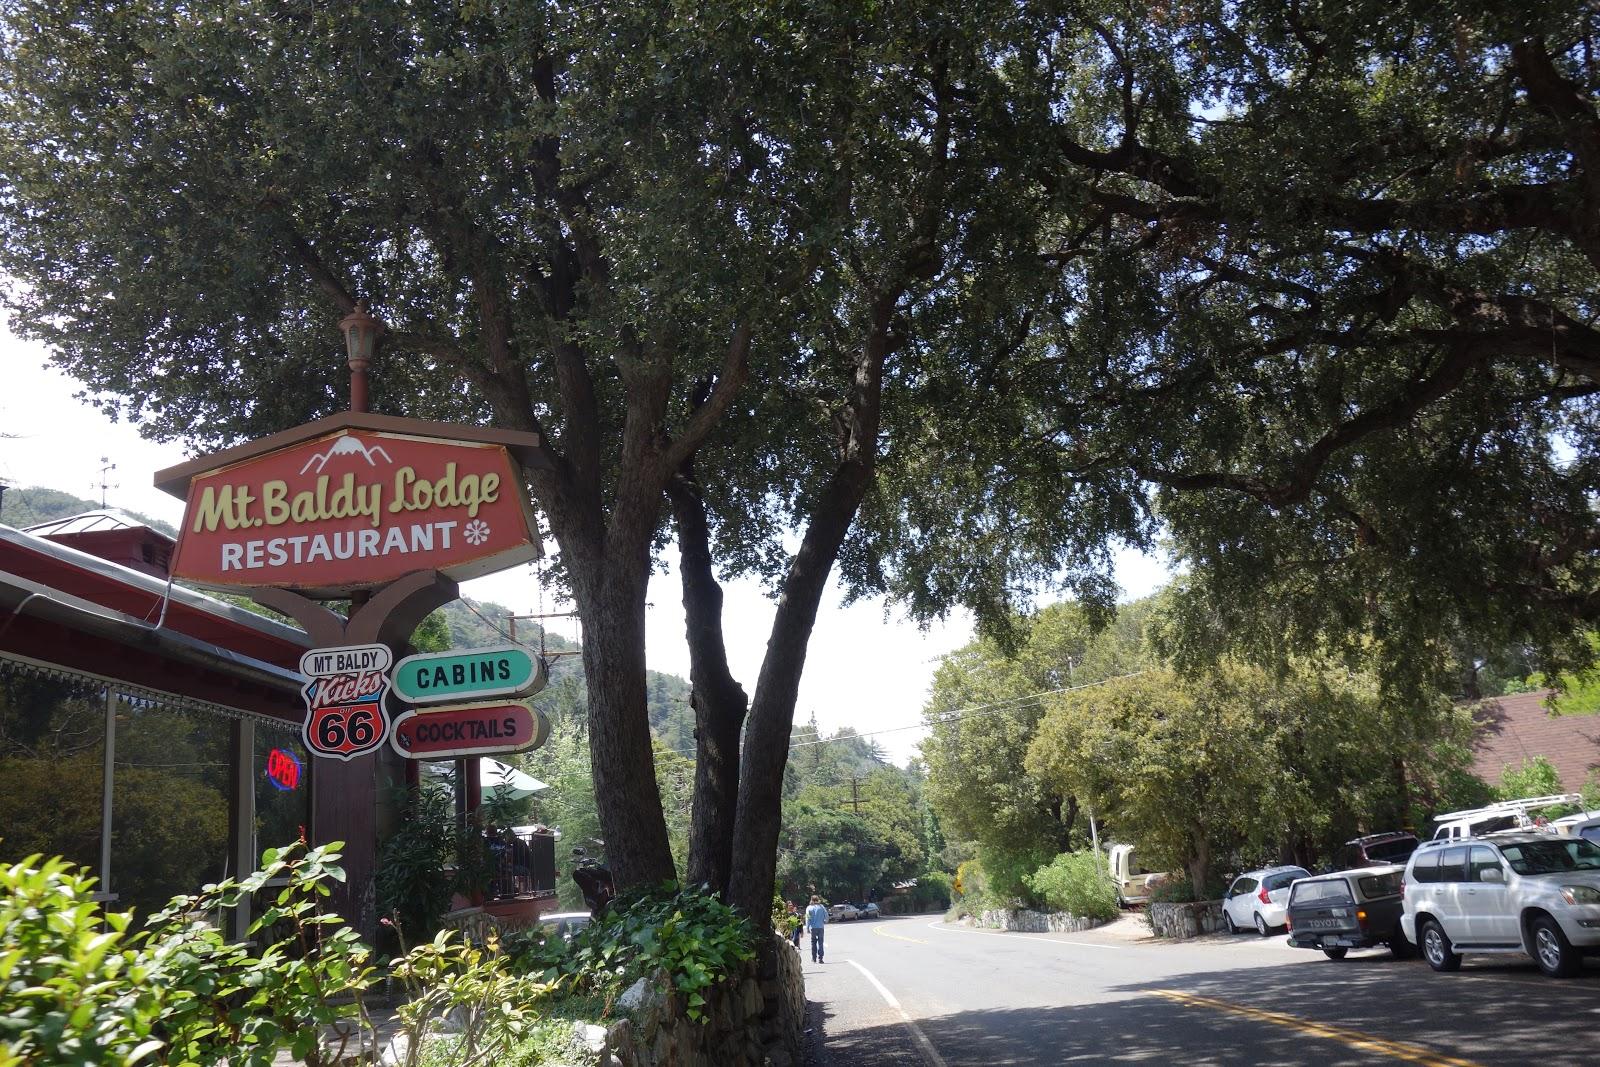 Restaurant sign - Mt Baldy Lodge Restaurant on climb by bike to Mt Baldy - Mt Baldy Village